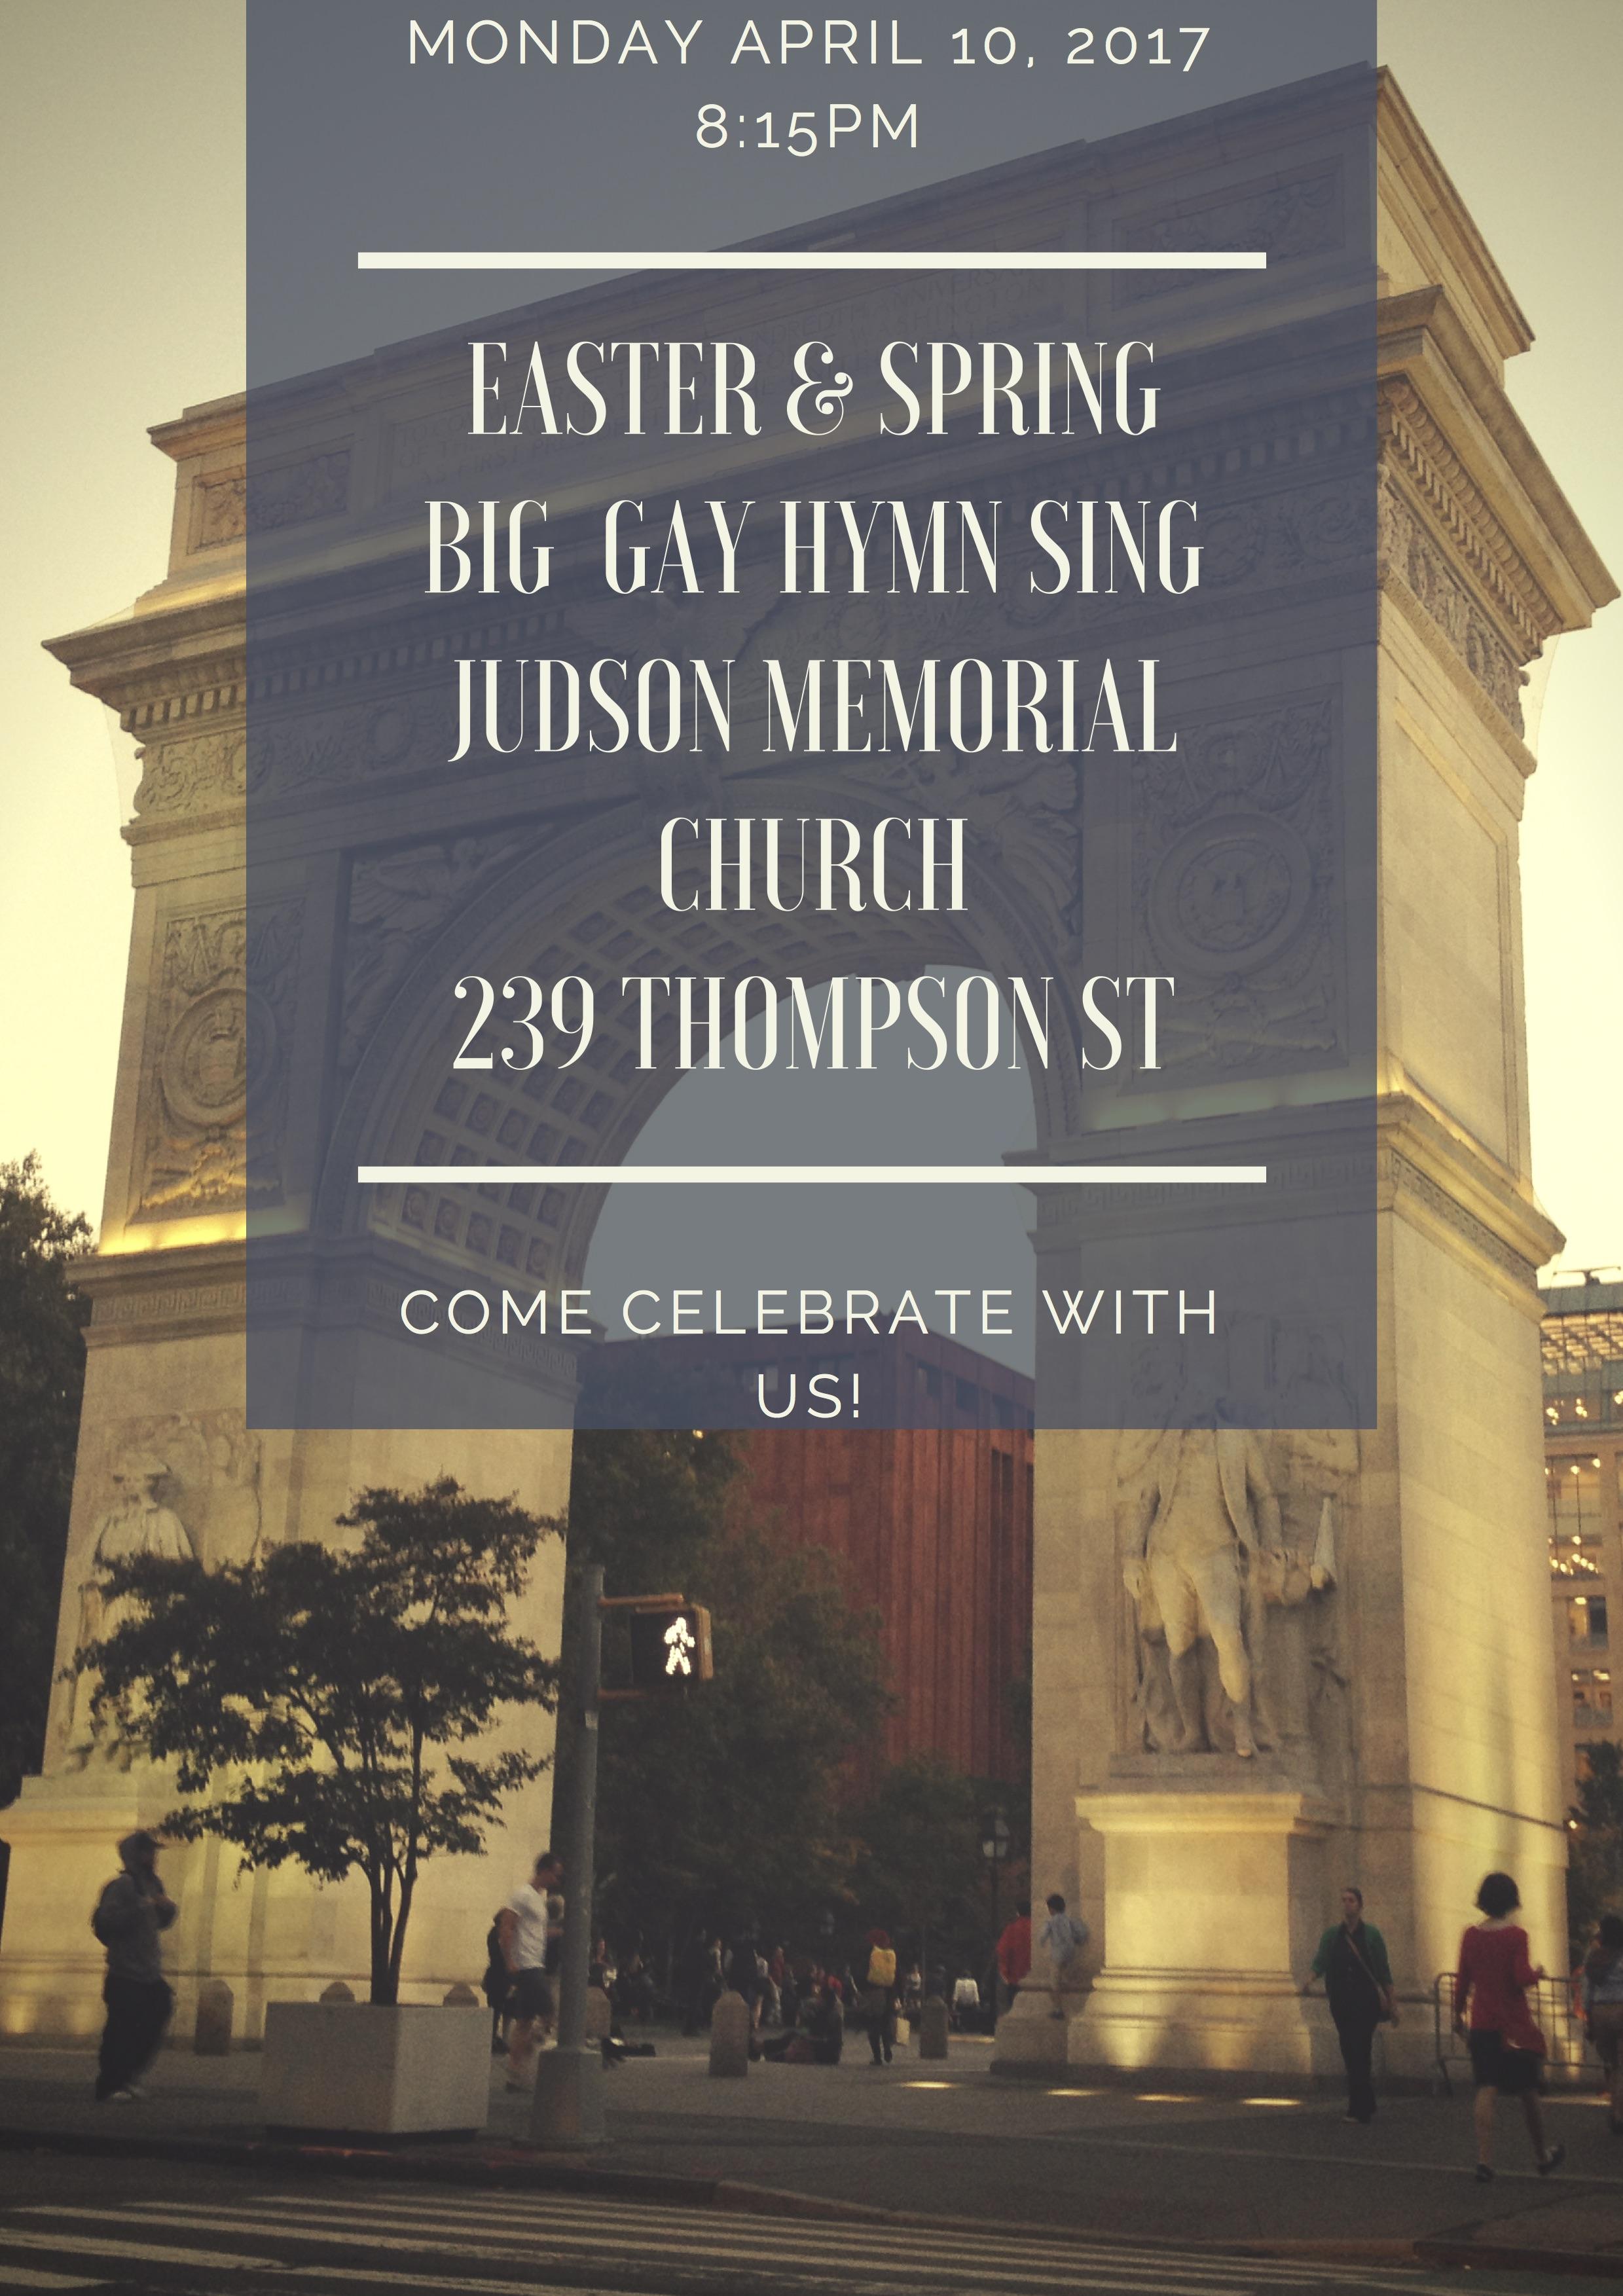 Washington Square Arch - Poster.jpeg